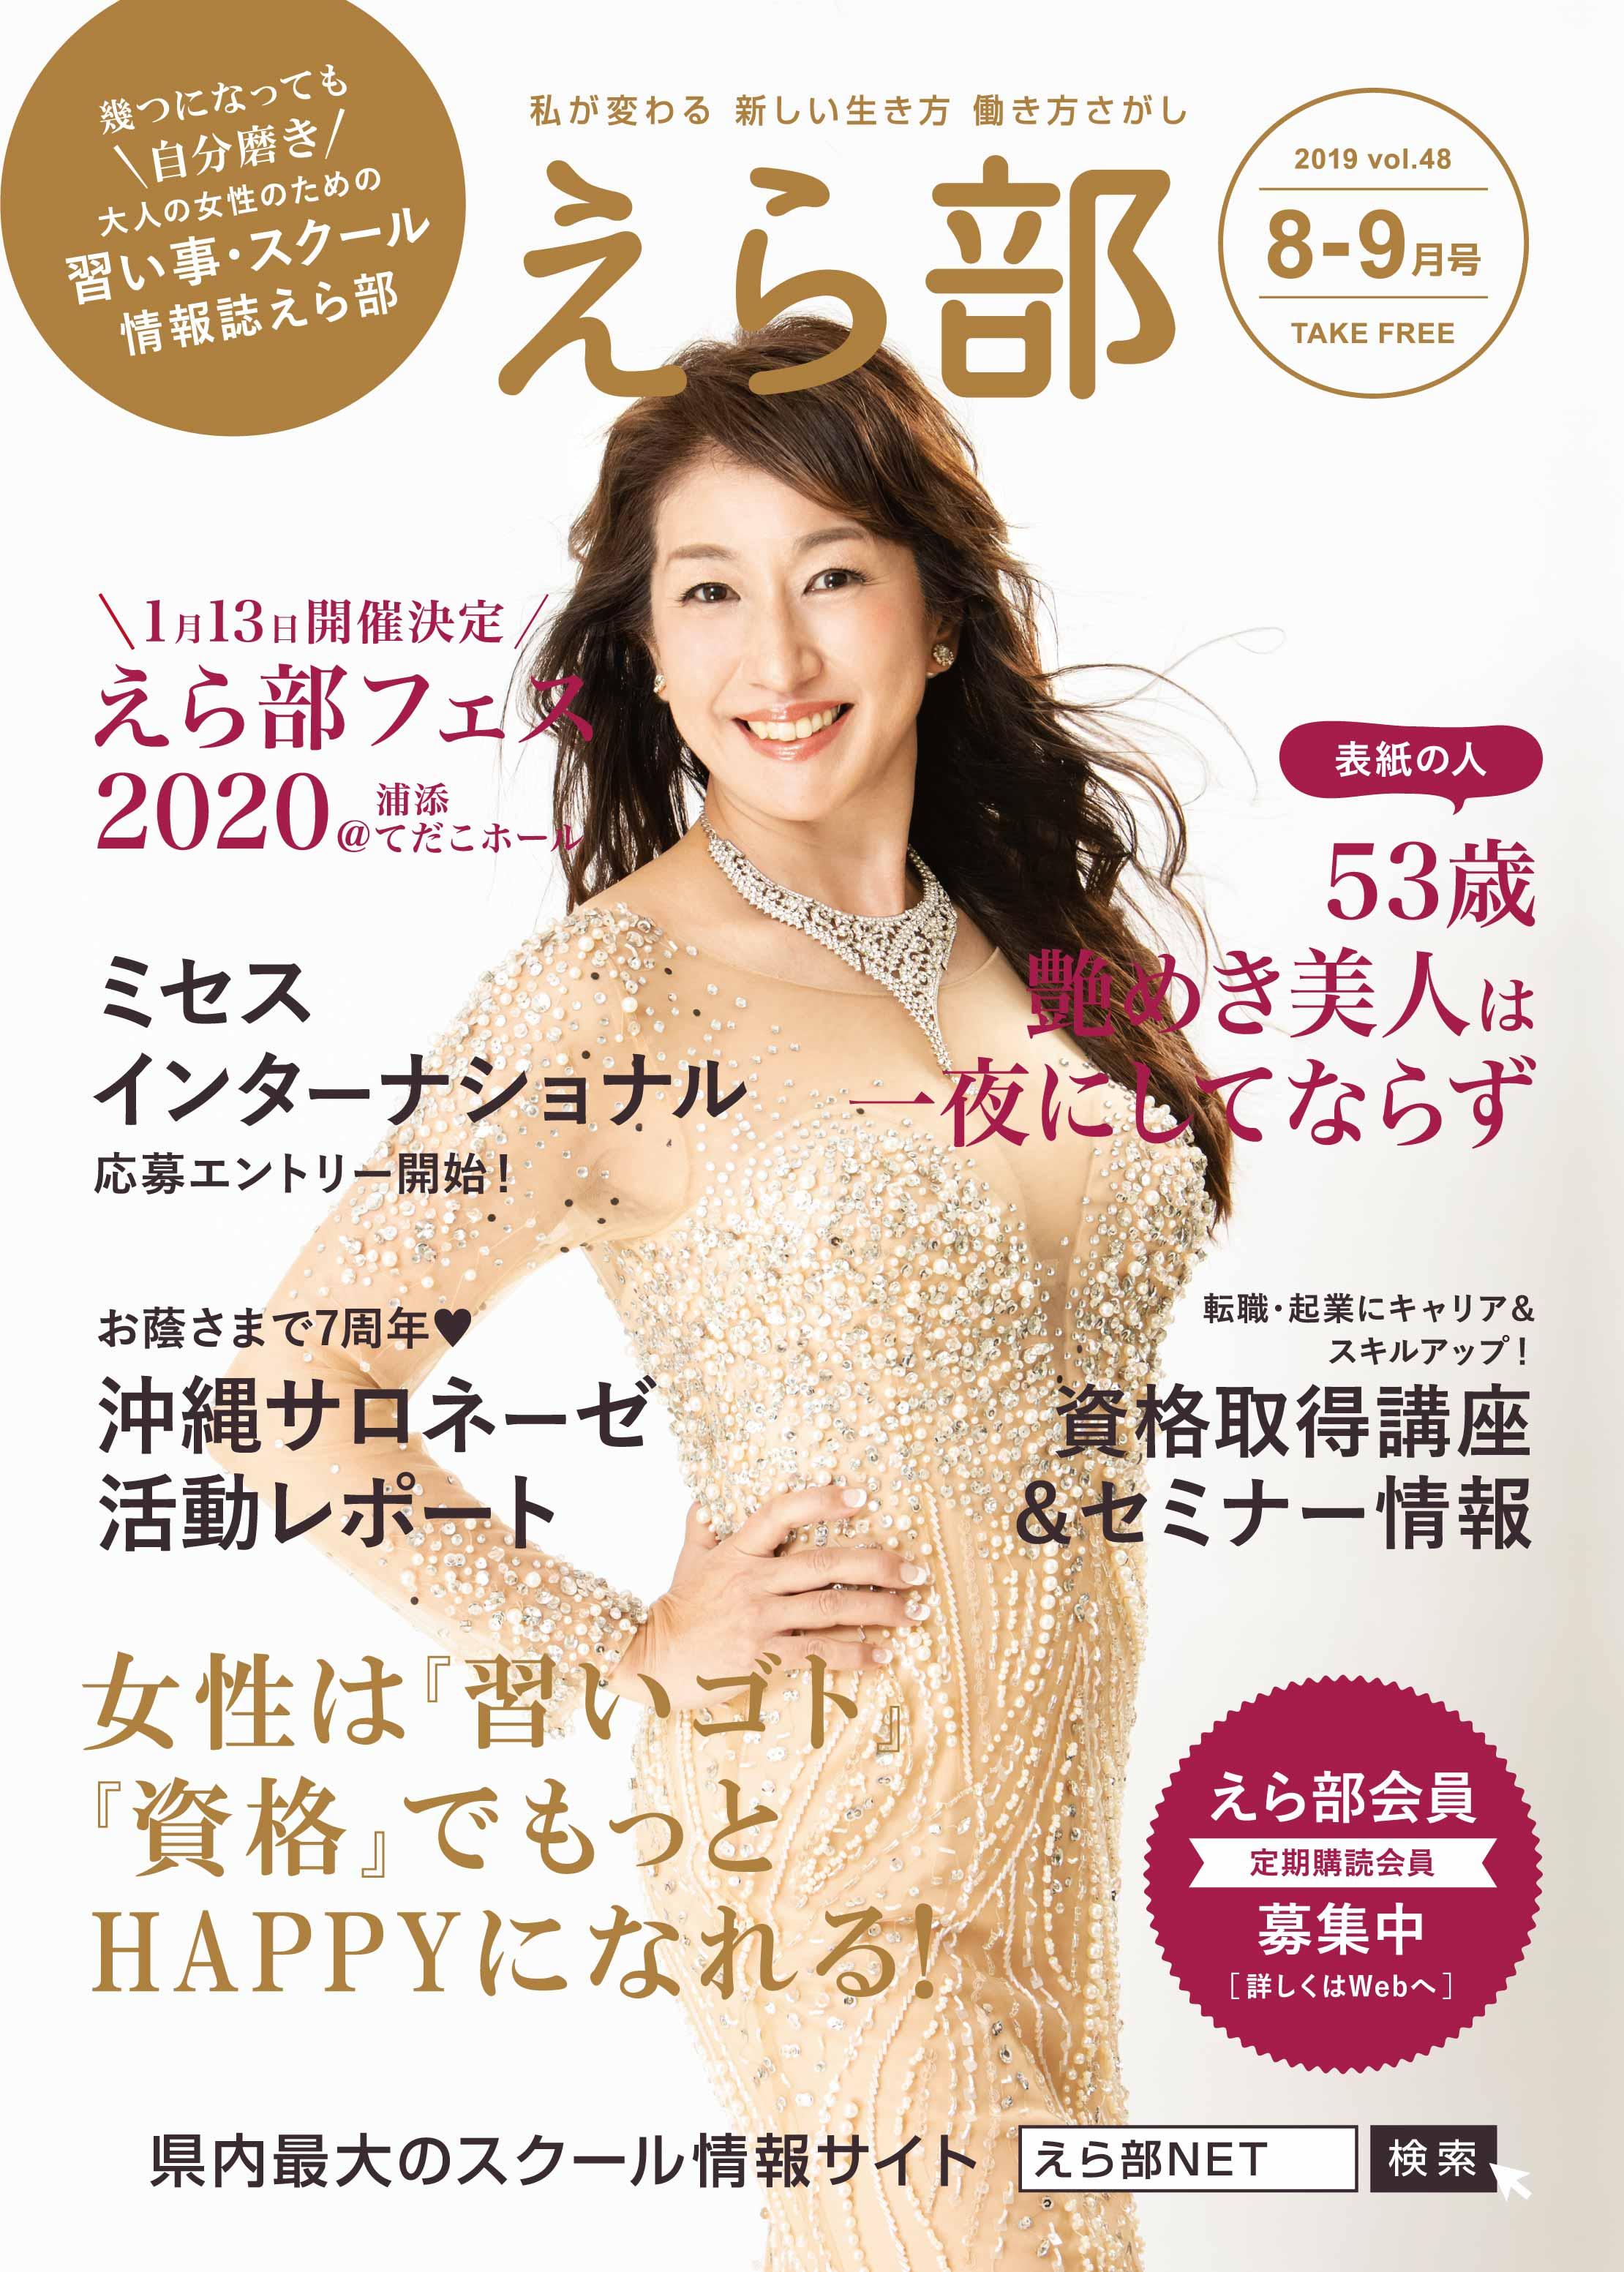 1p_2019_08_09_hyoushi_01